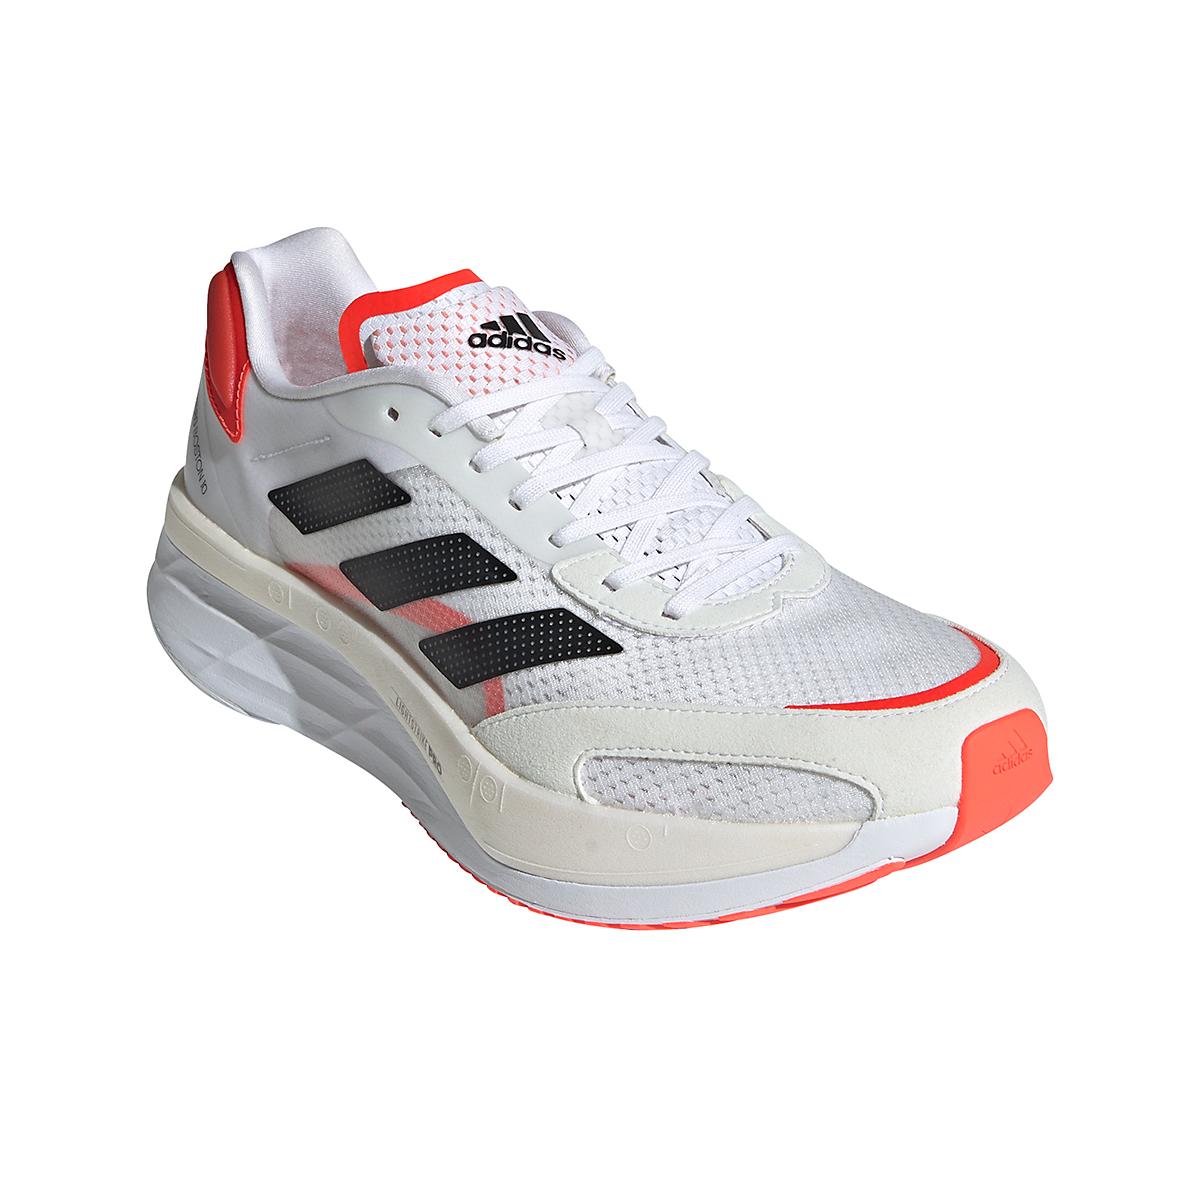 Men's Adidas Adizero Boston 10 Running Shoe - Color: Black/White/Solar Red - Size: 7 - Width: Regular, Black/White/Solar Red, large, image 3